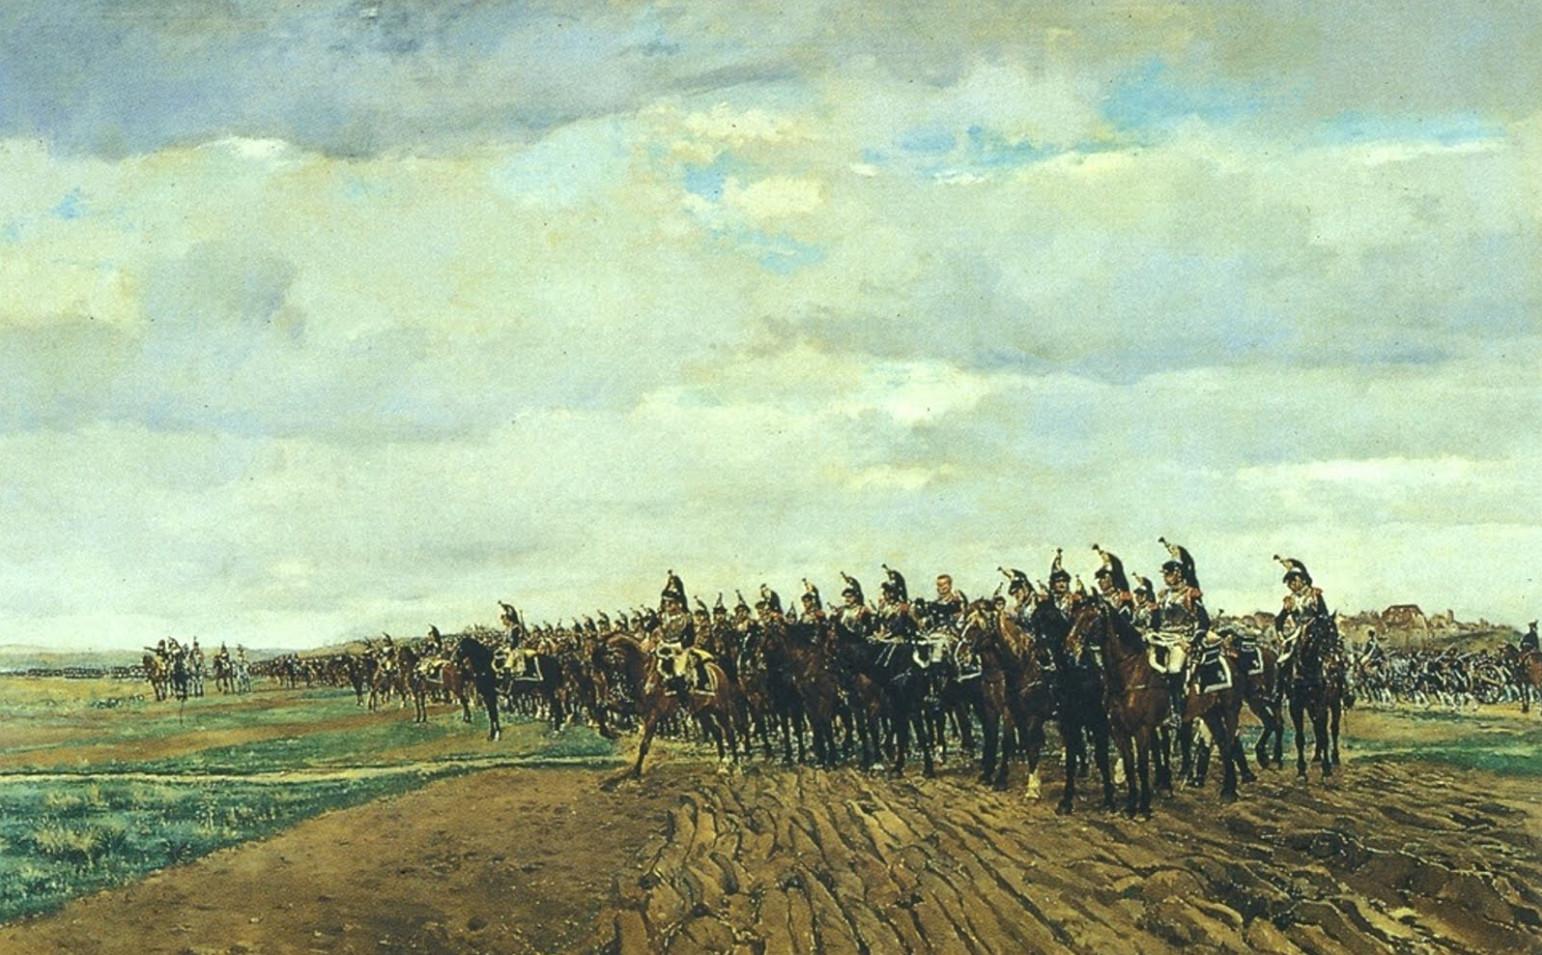 Image - Les Cuirassiers, 1805